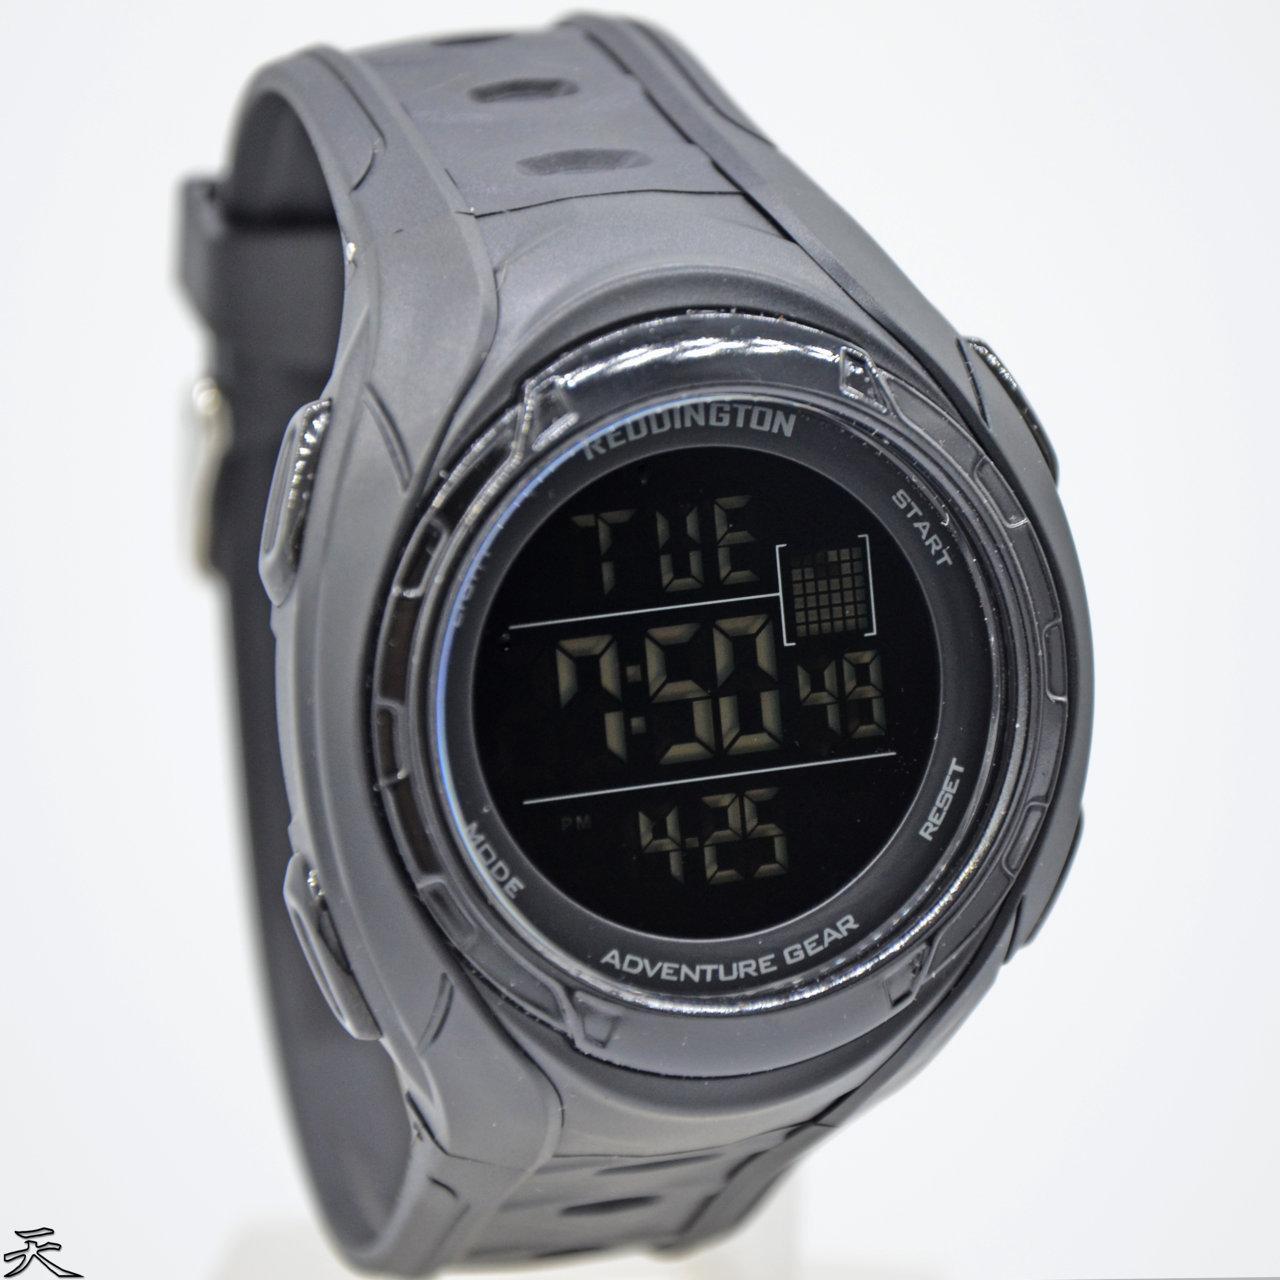 Original Digital Watch - Reddington 6028 - Jam Tangan Sport Pria - Rubber Strap